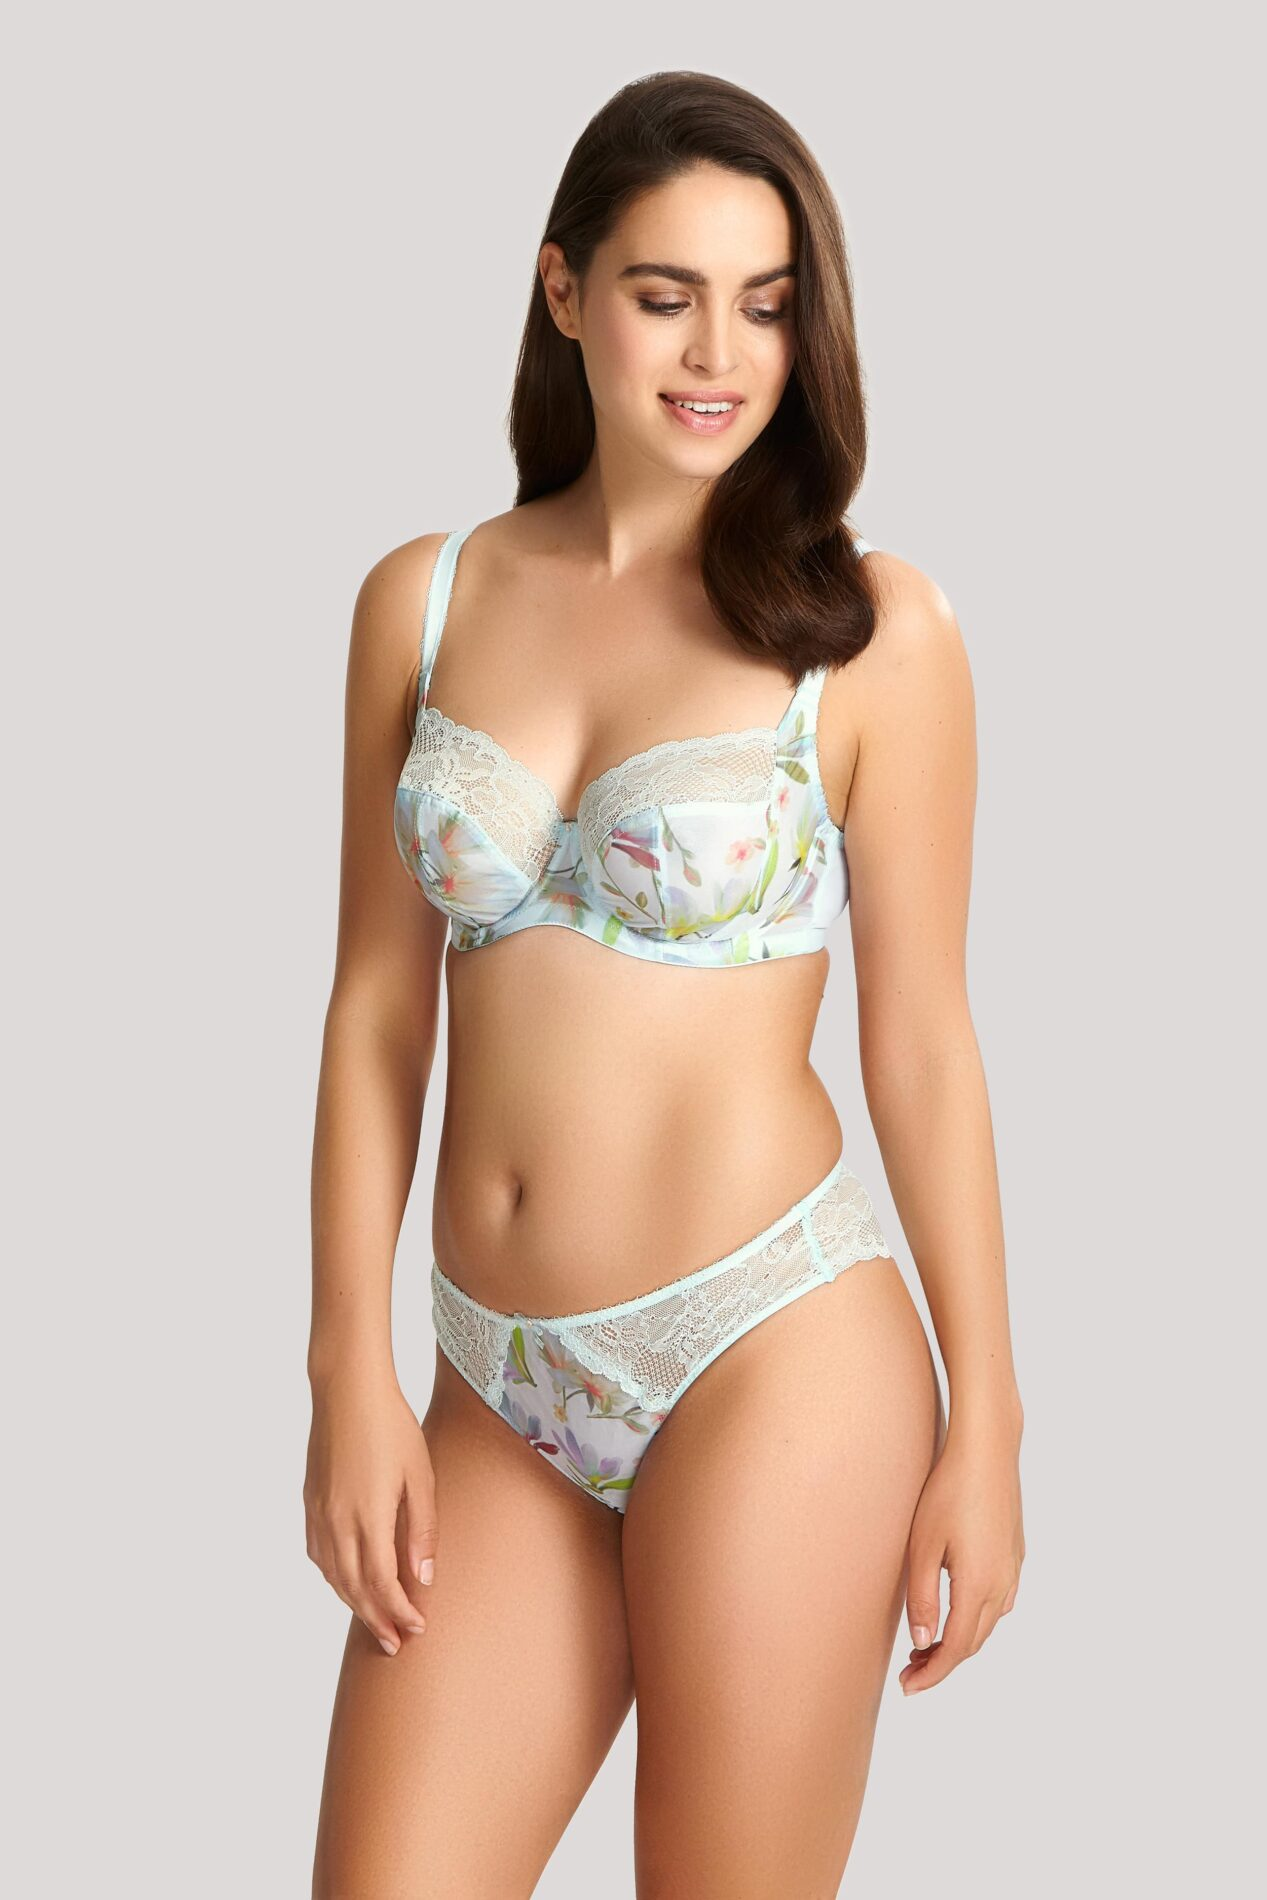 Бюстгальтеры 6951_449_1 Jasmine Balconnet Pastel Floral T F 1-min